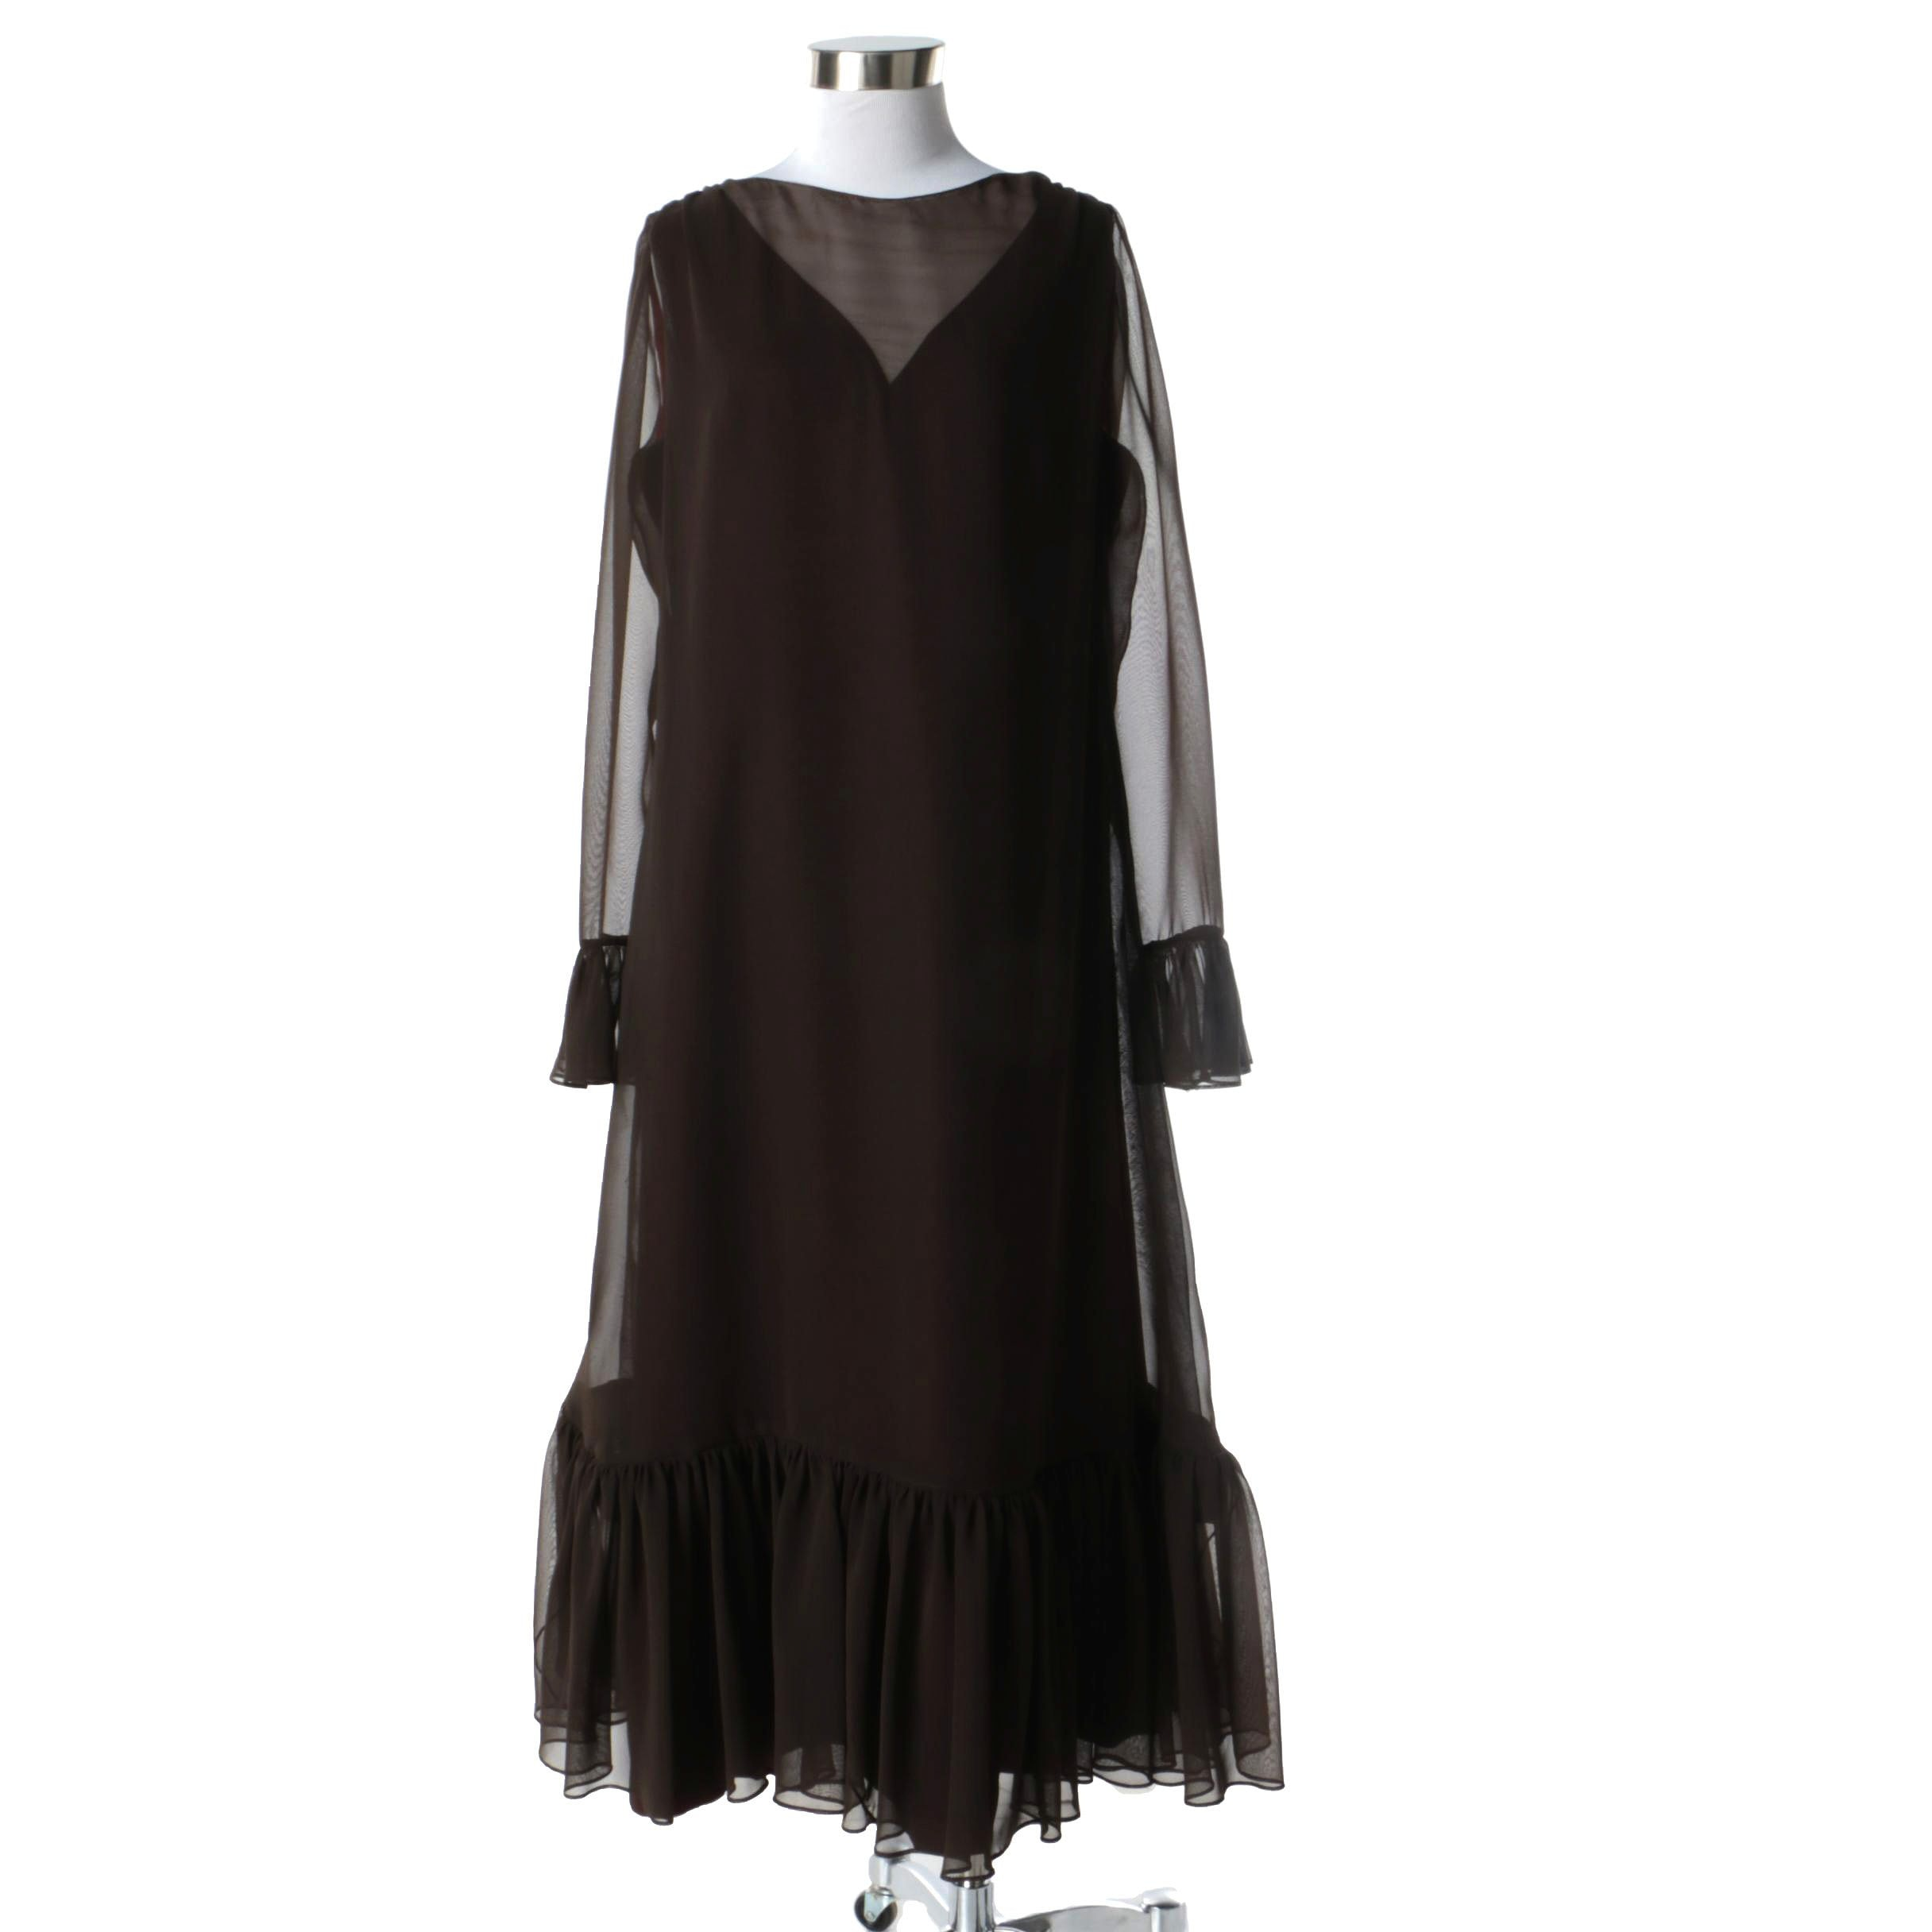 1980s Vintage Gene Roy Chocolate Brown Chiffon Ruffle Silk Midi Dress